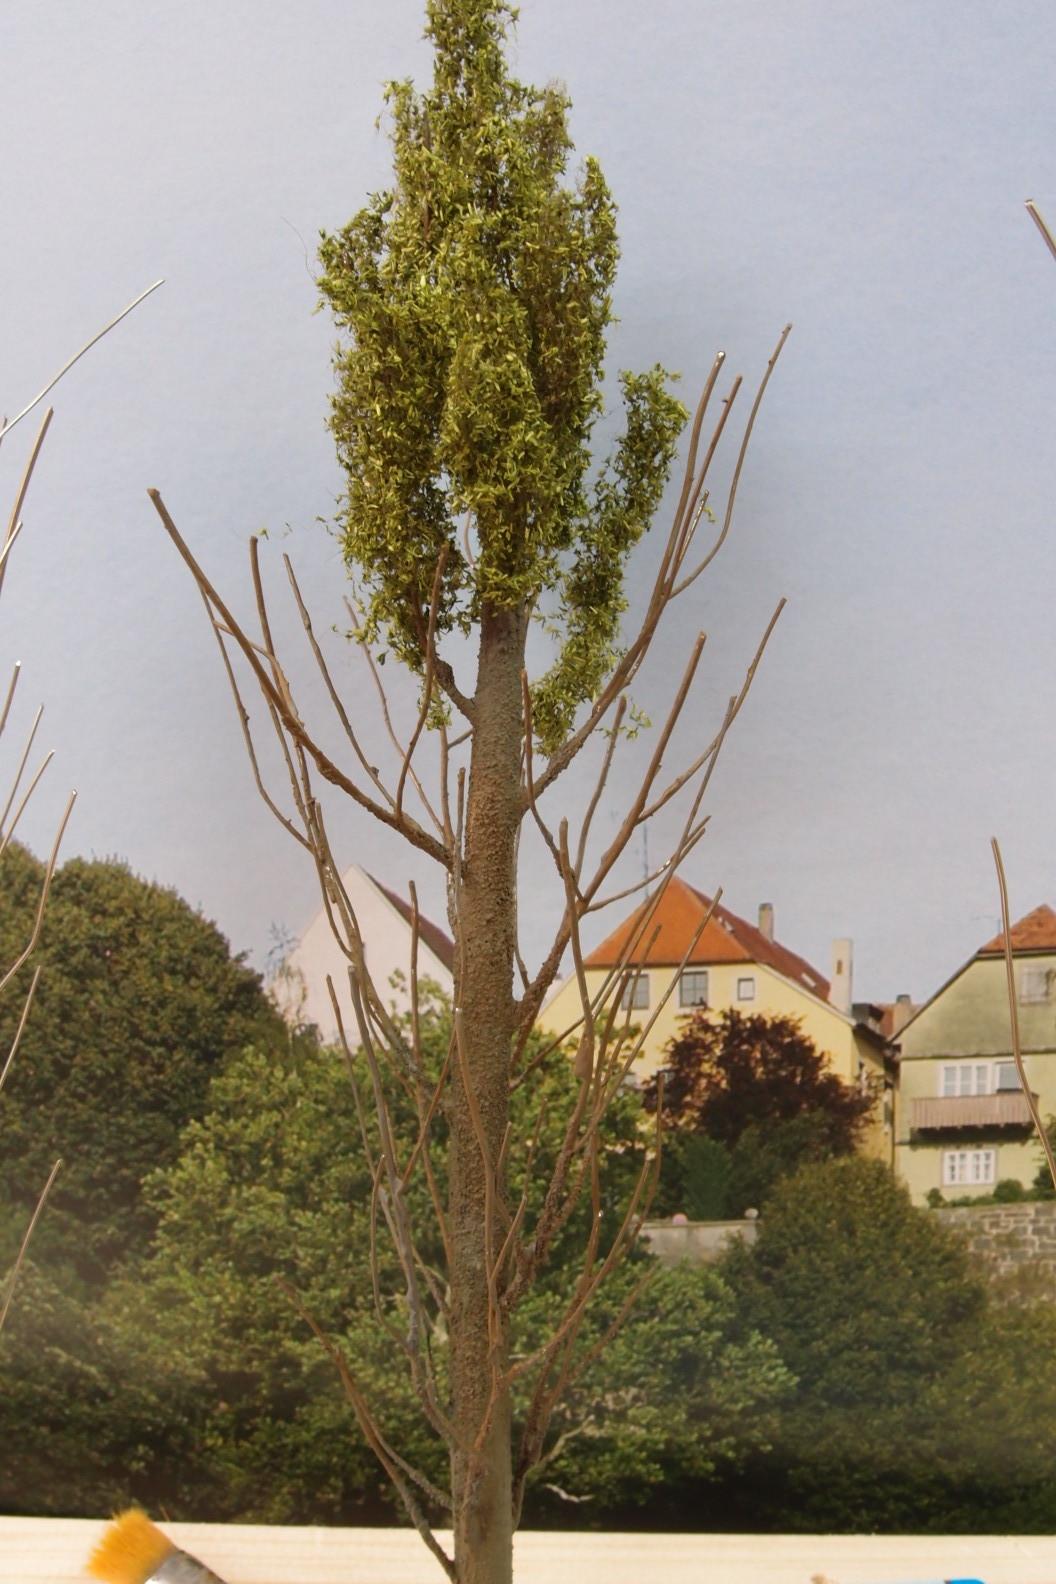 Baumspitze belaubt